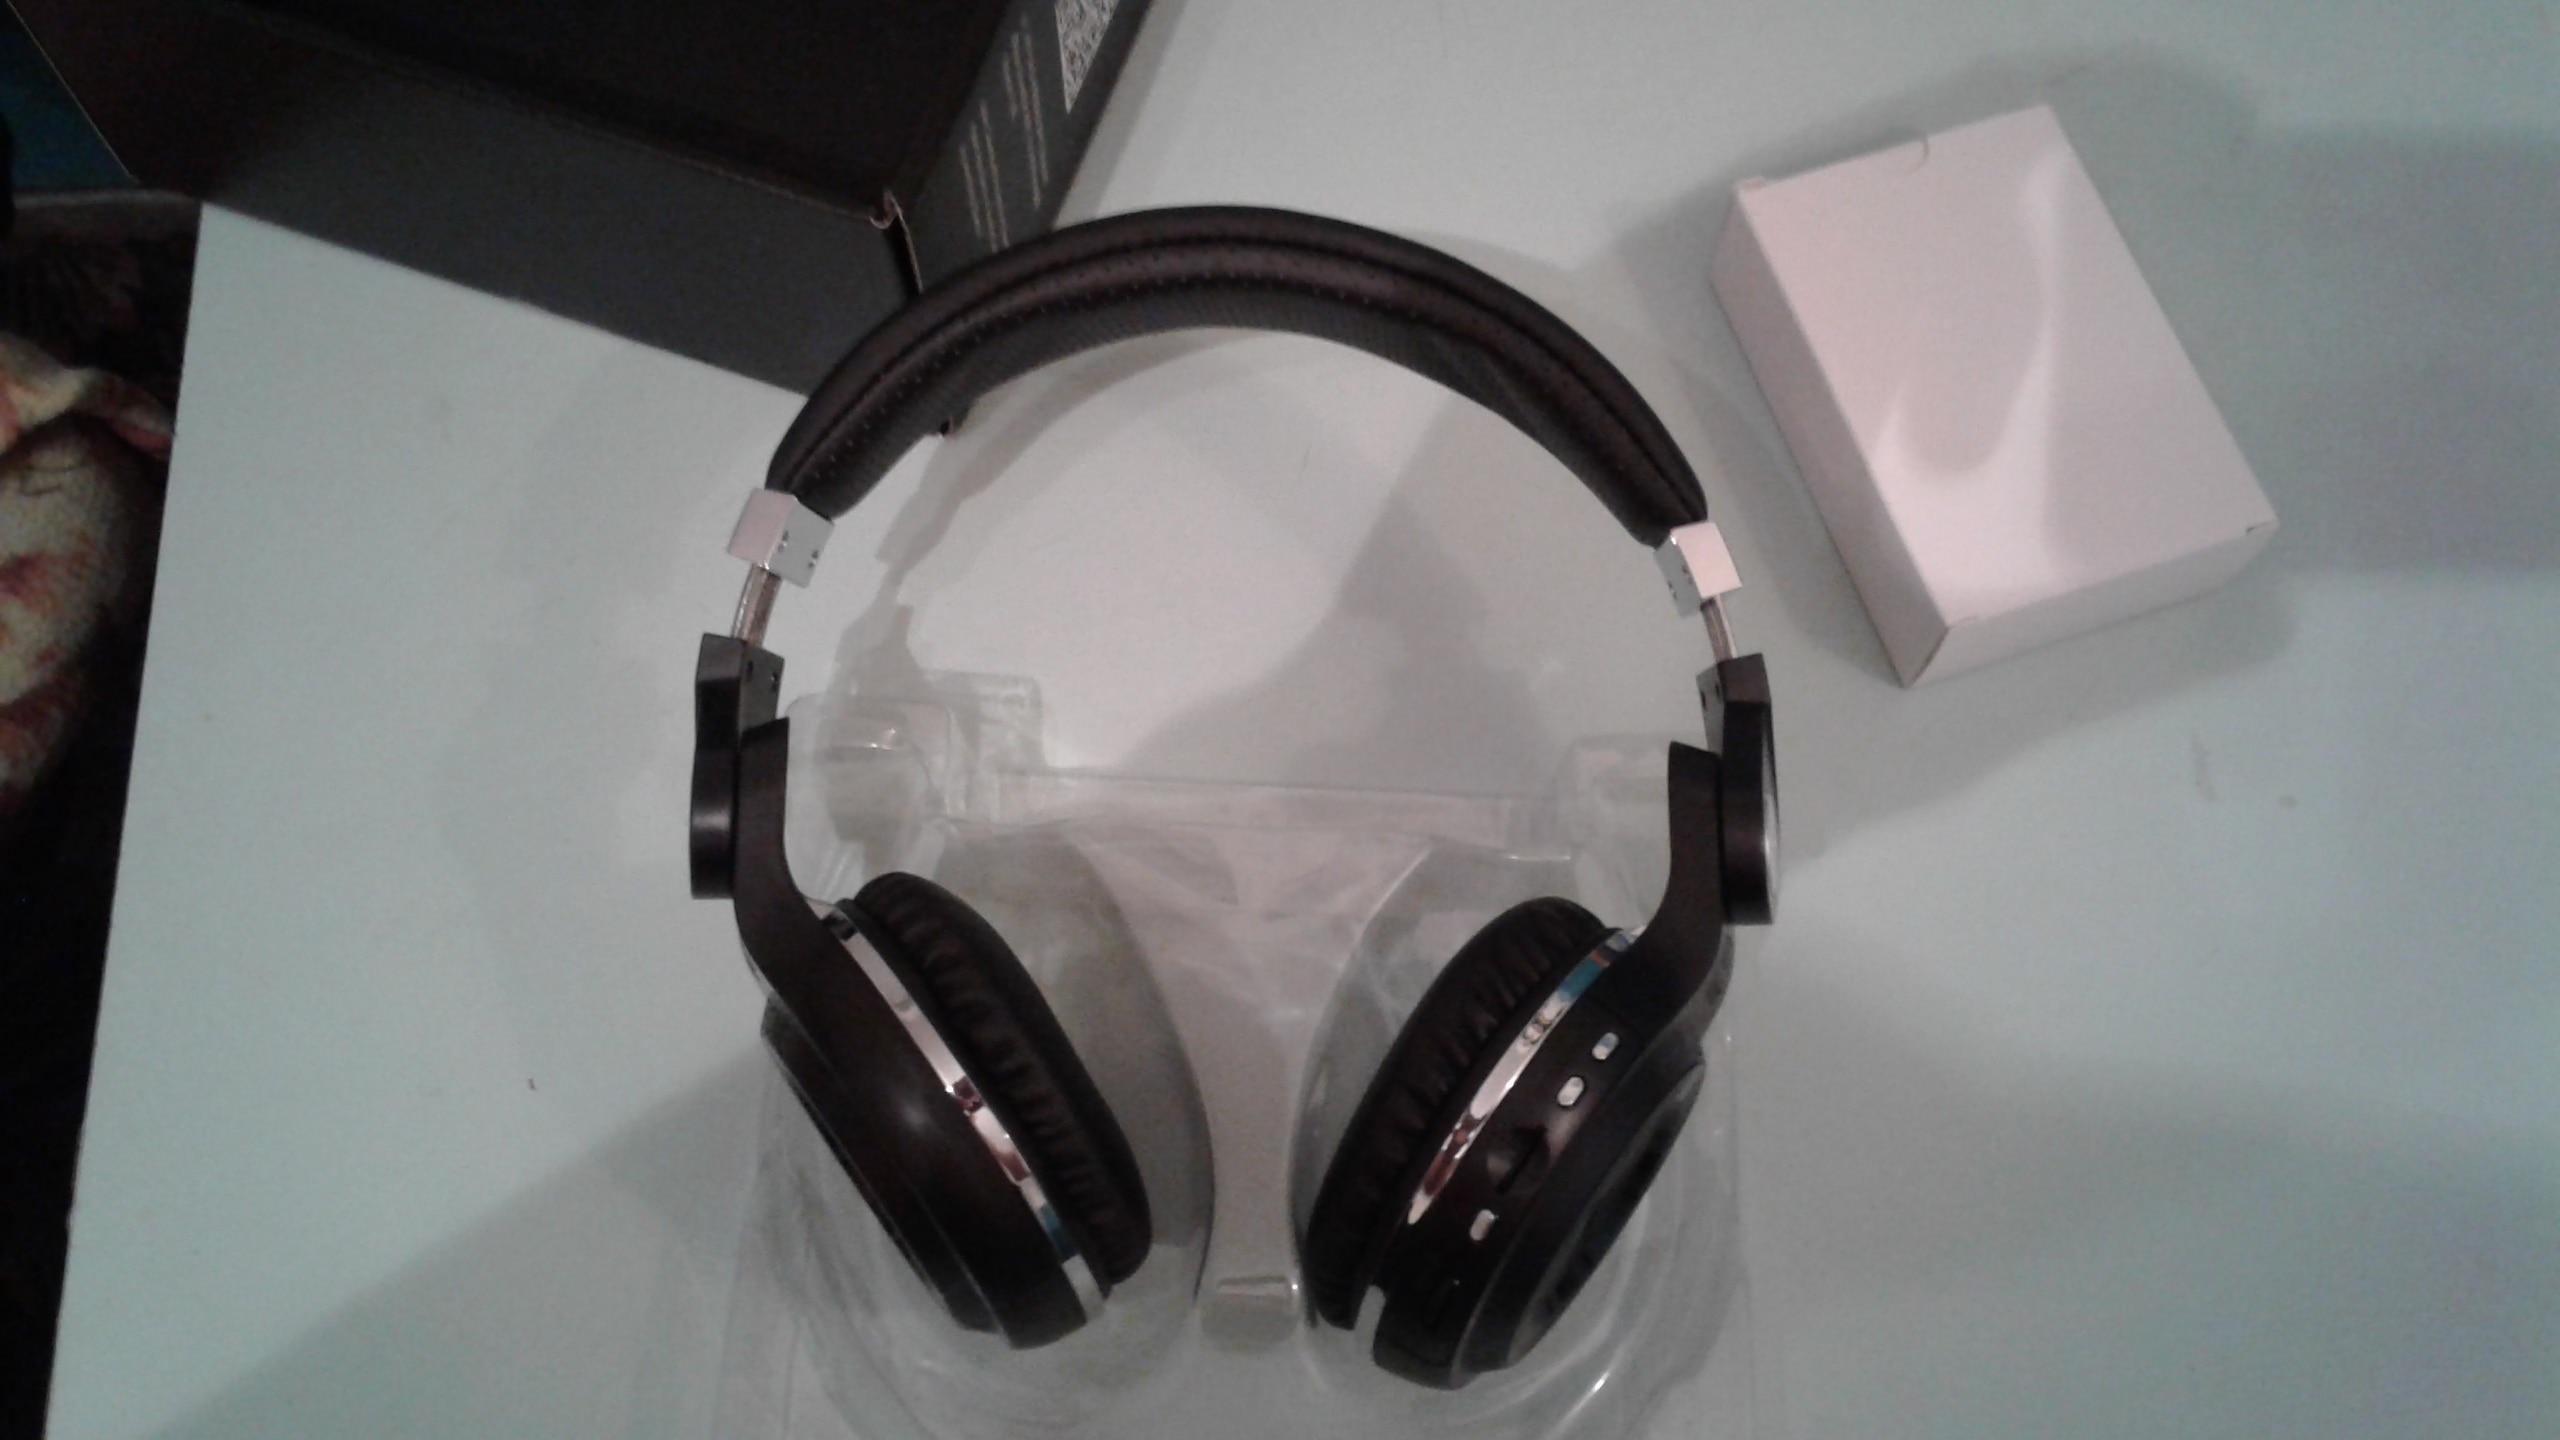 Bluedio T2+ Powerful Bass Stereo Bluetooth 5.0 Headphone Wireless Headset Support FM Radio Micro SD Card Play With Microphone stereo bluetooth bluetooth 4.1 bluetooth 4.1 headphones - AliExpress